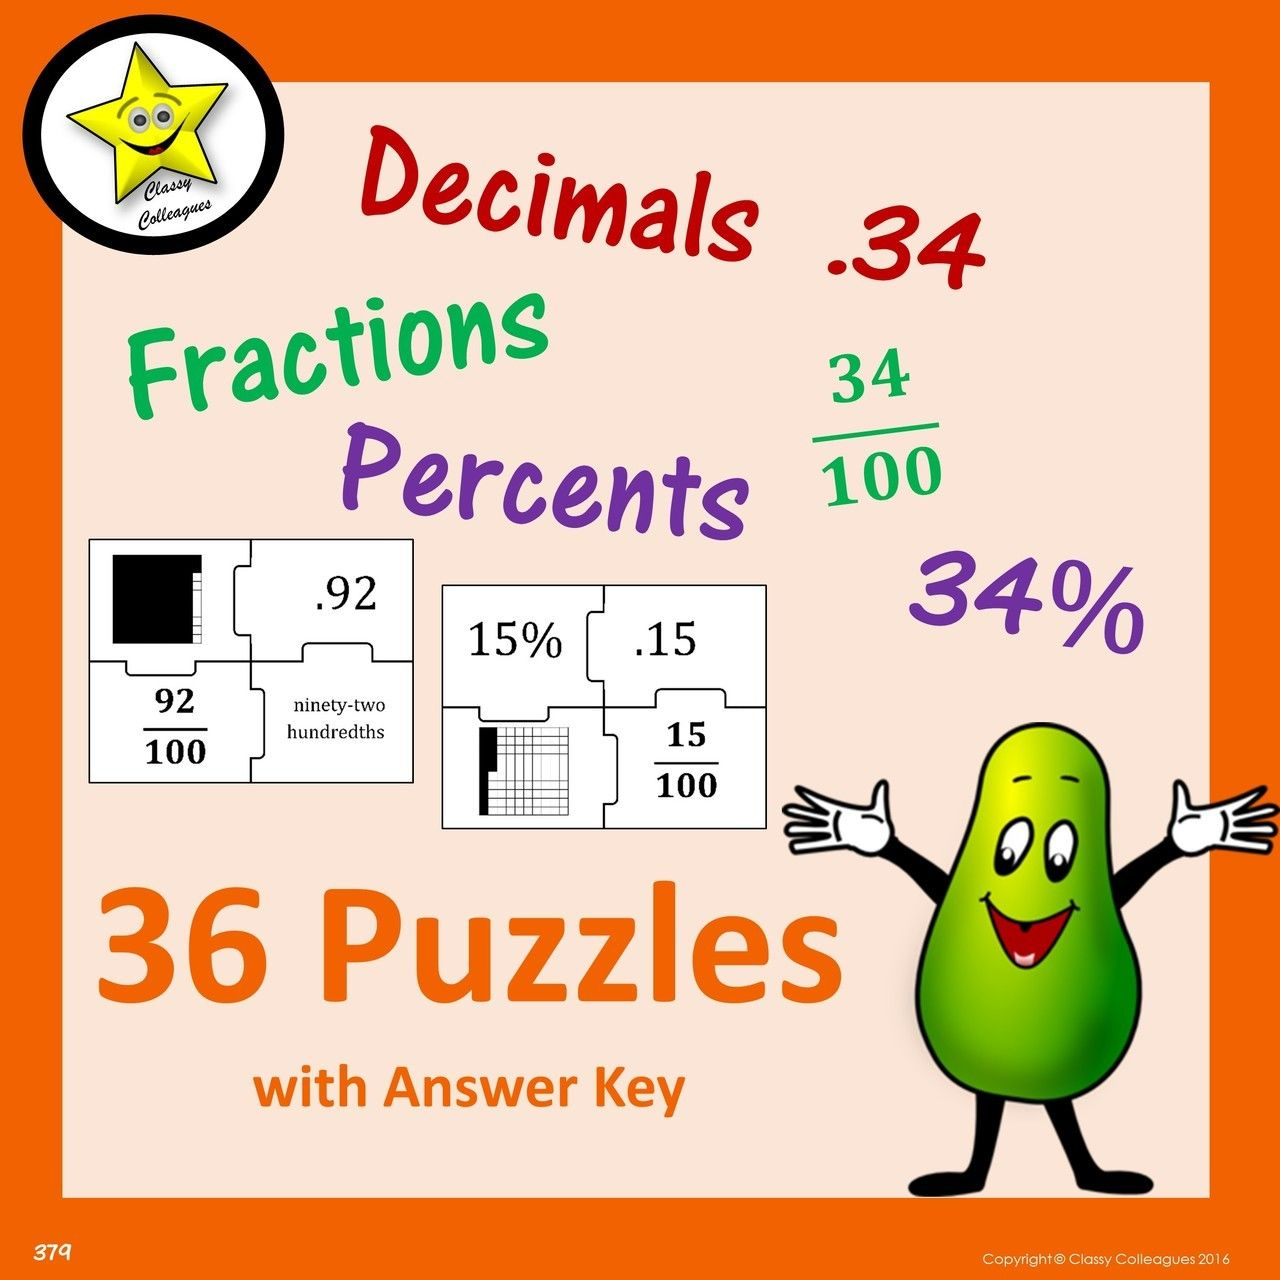 Decimal fraction percent puzzles teaching math fraction